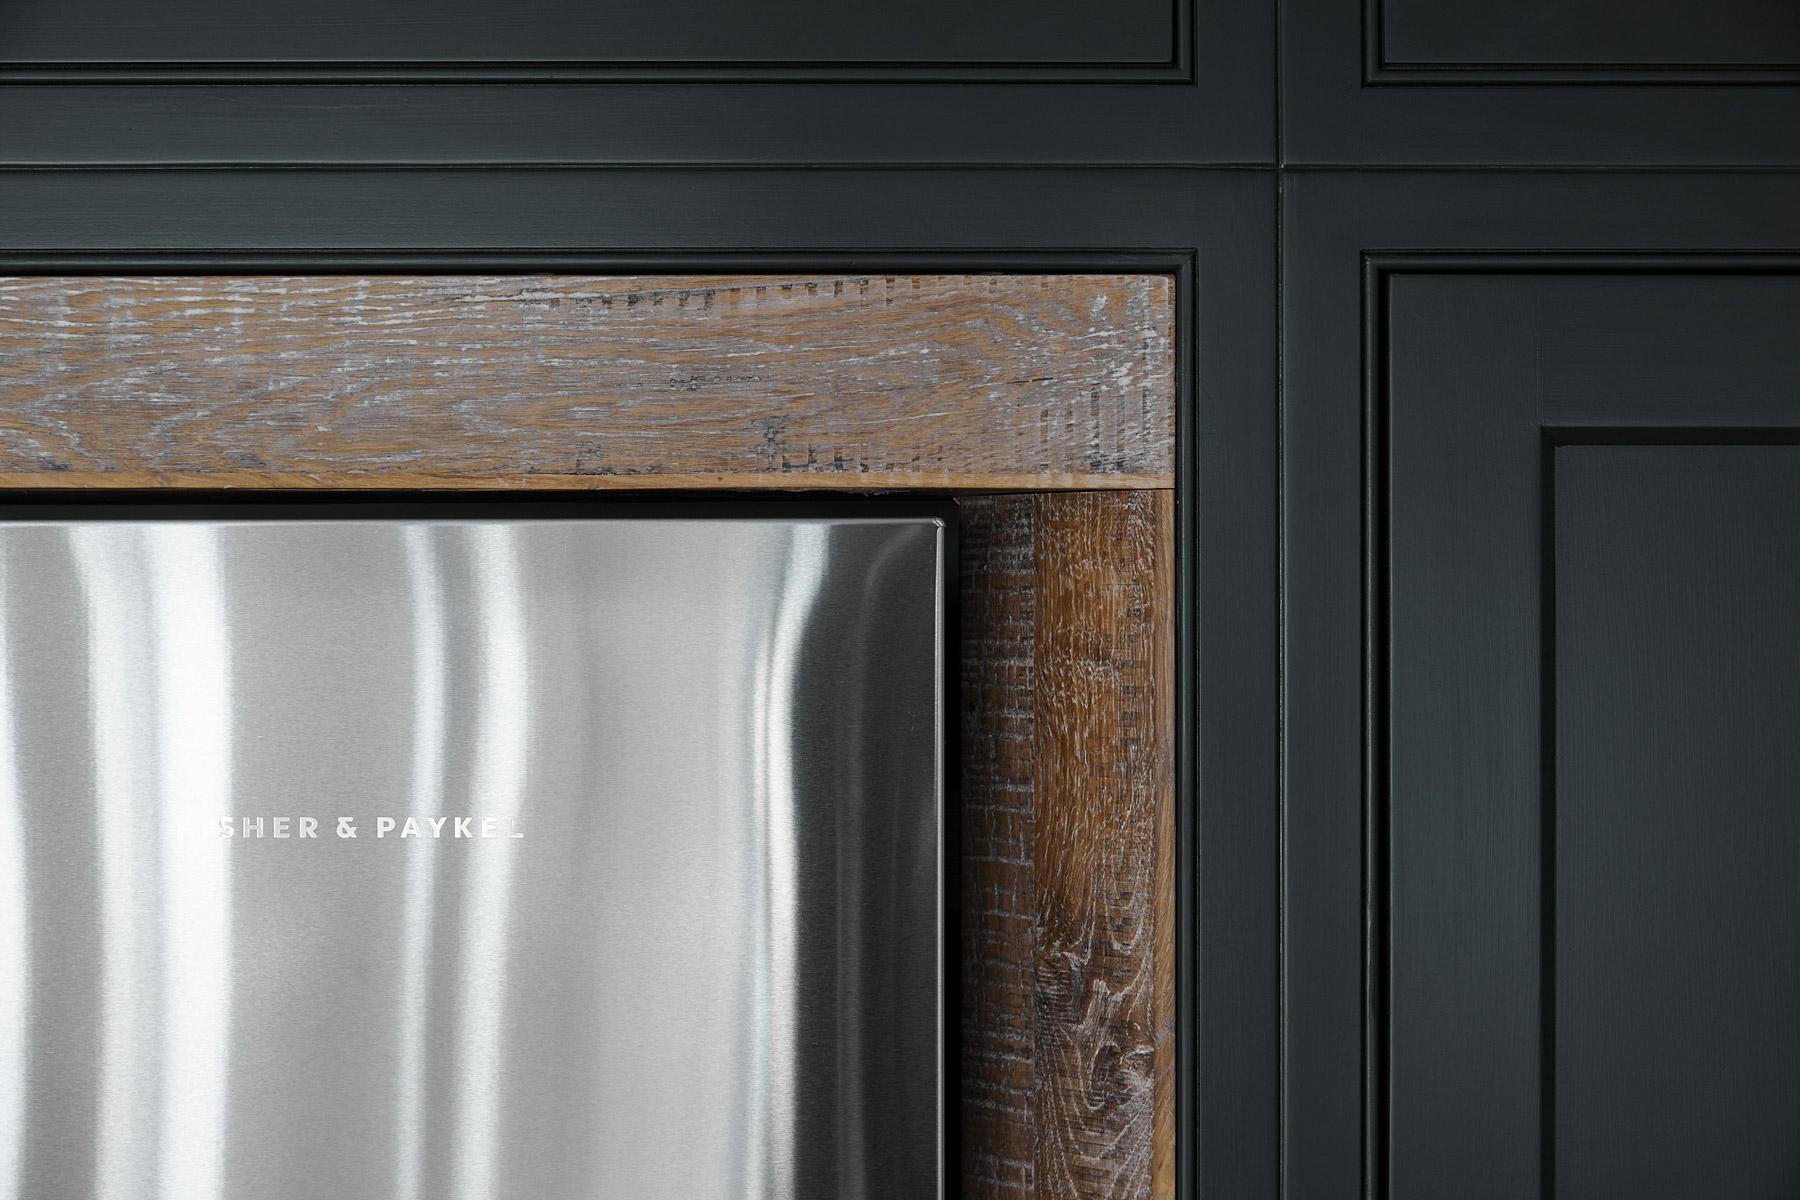 Fisher + Paykel stainless steel fridge freezer against reclaimed oak surround